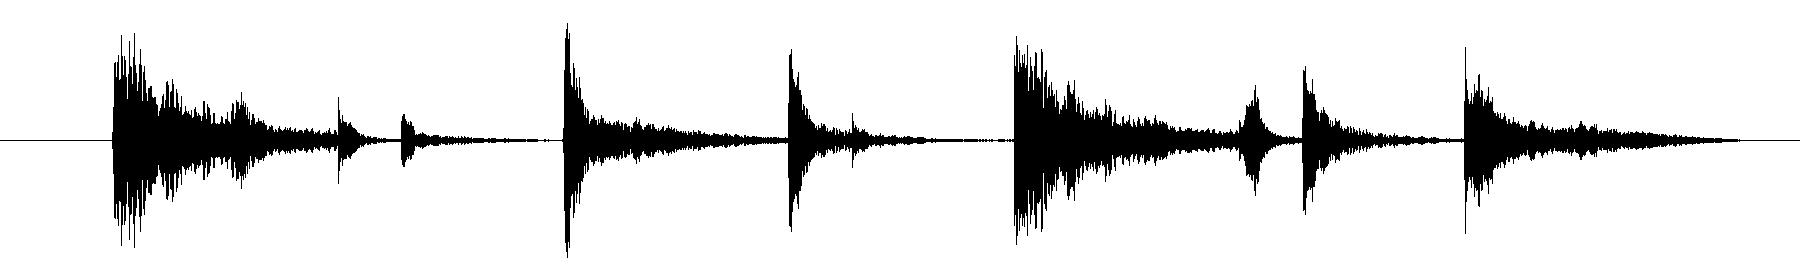 g abs05 091